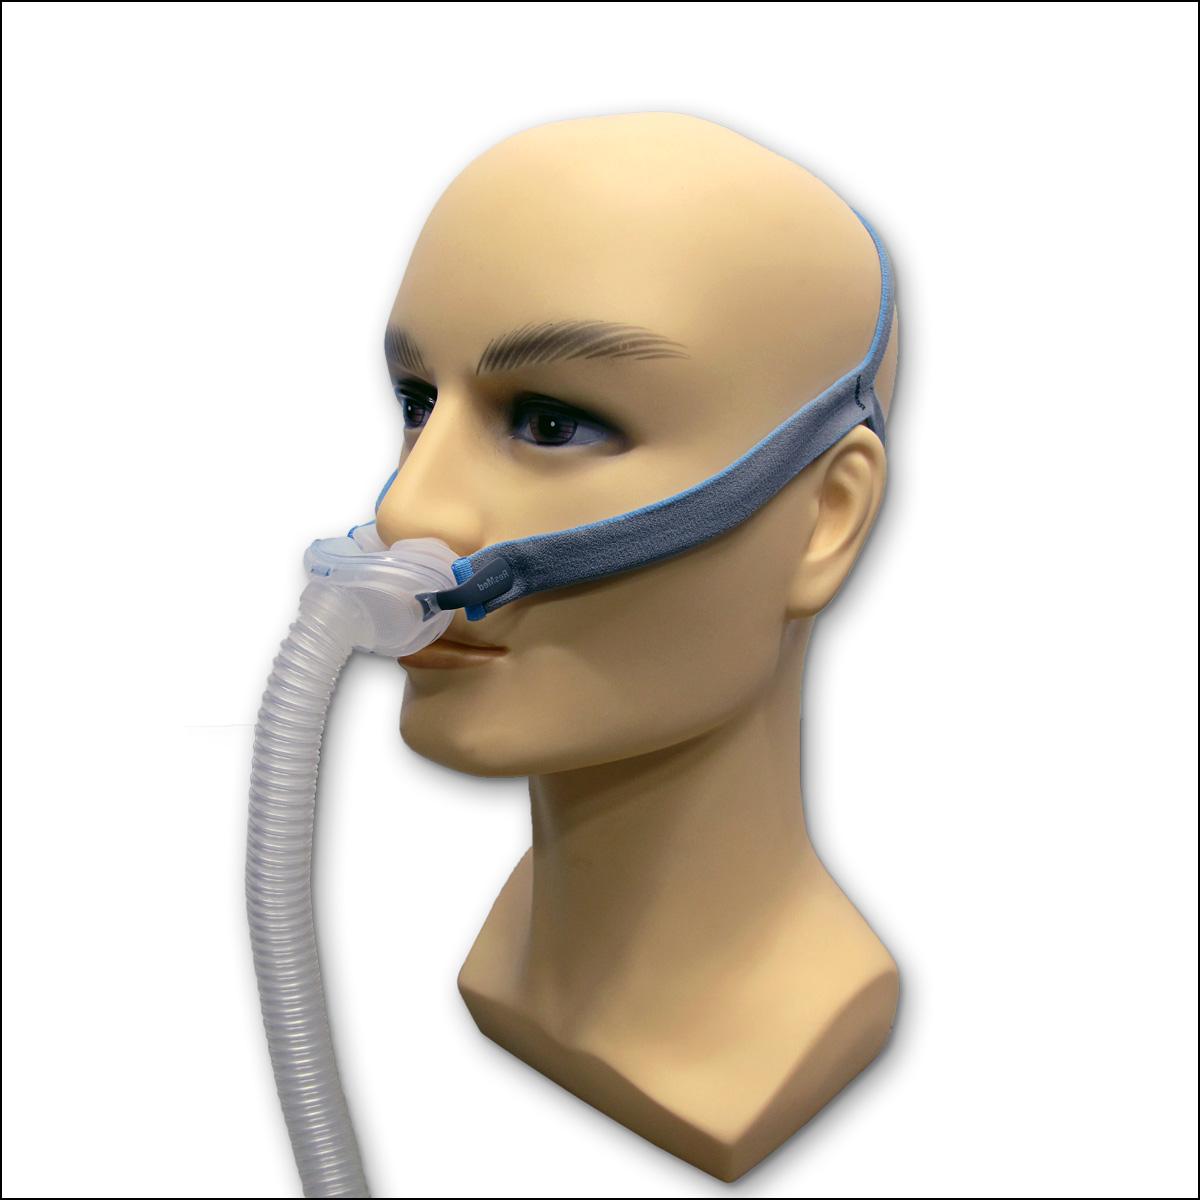 Cnsac Resmed Airfit P10 Nasal Pillow Mask Cnsac